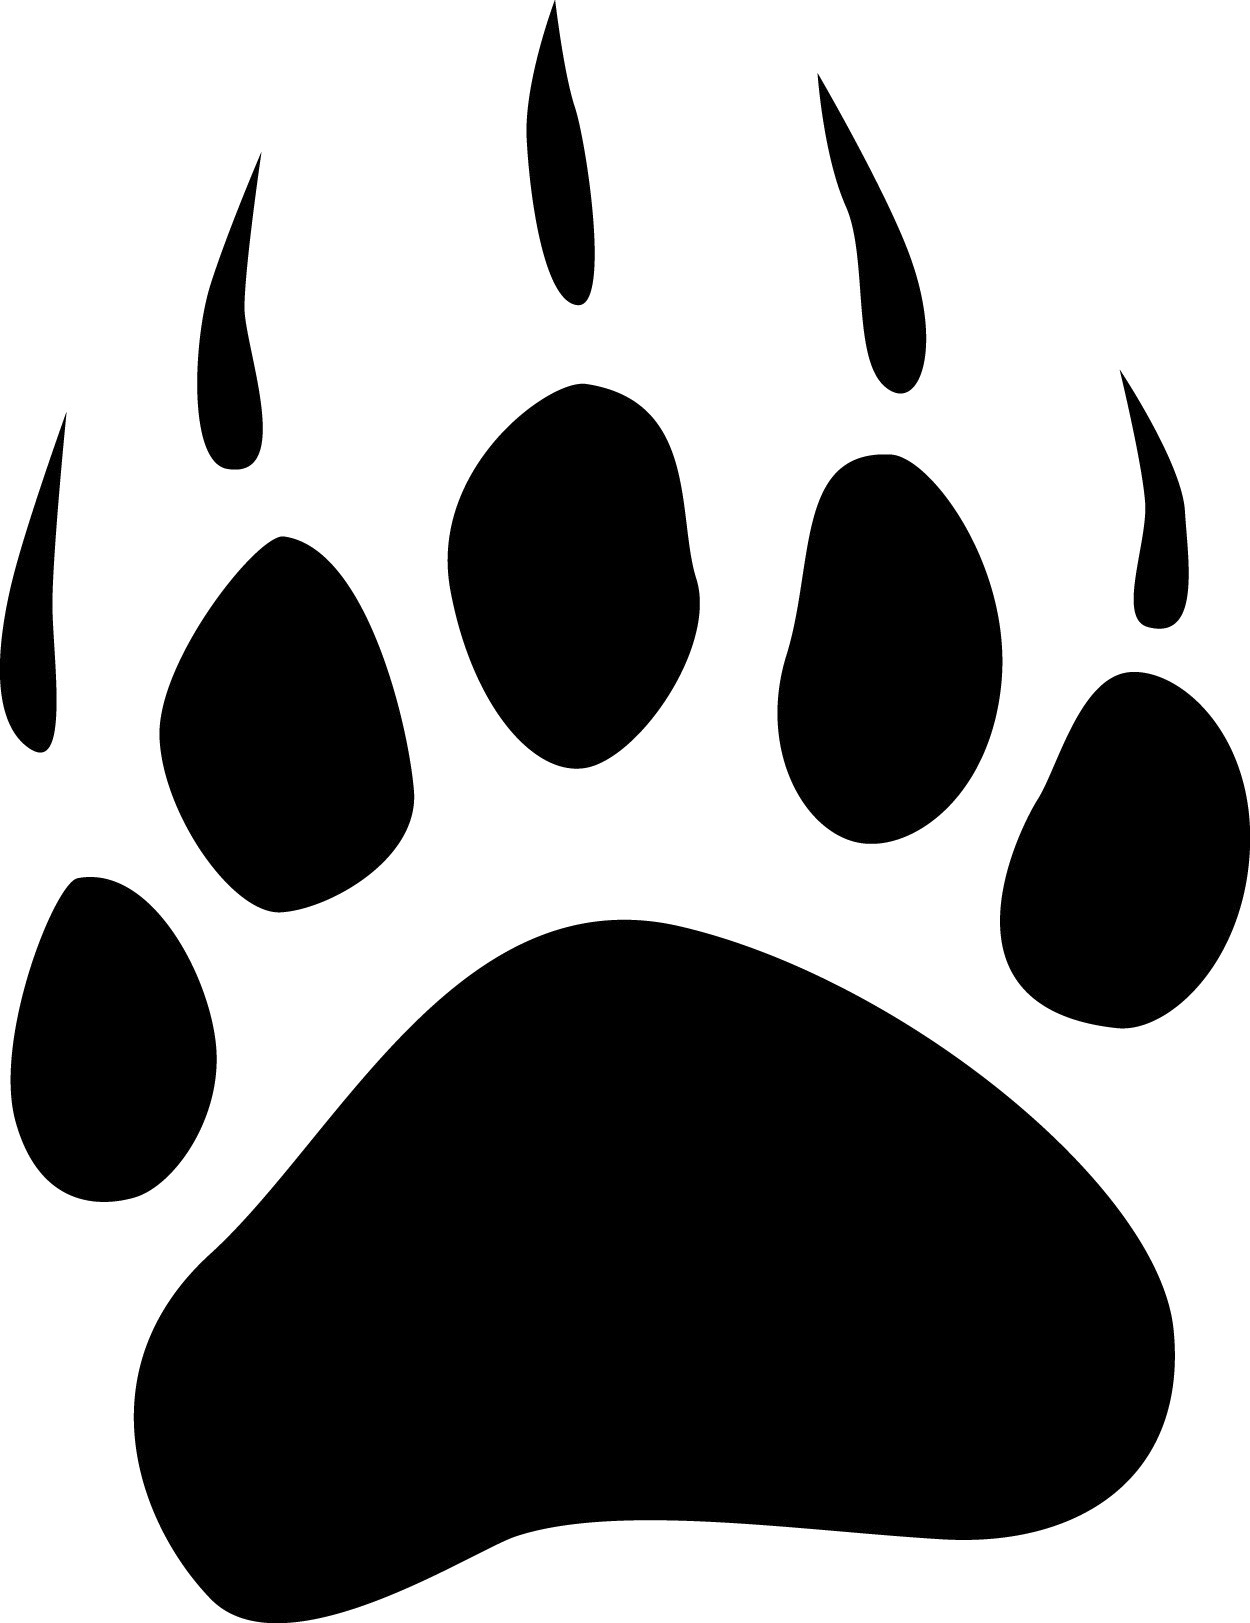 Bear paw print clip art collection image b id com server 01